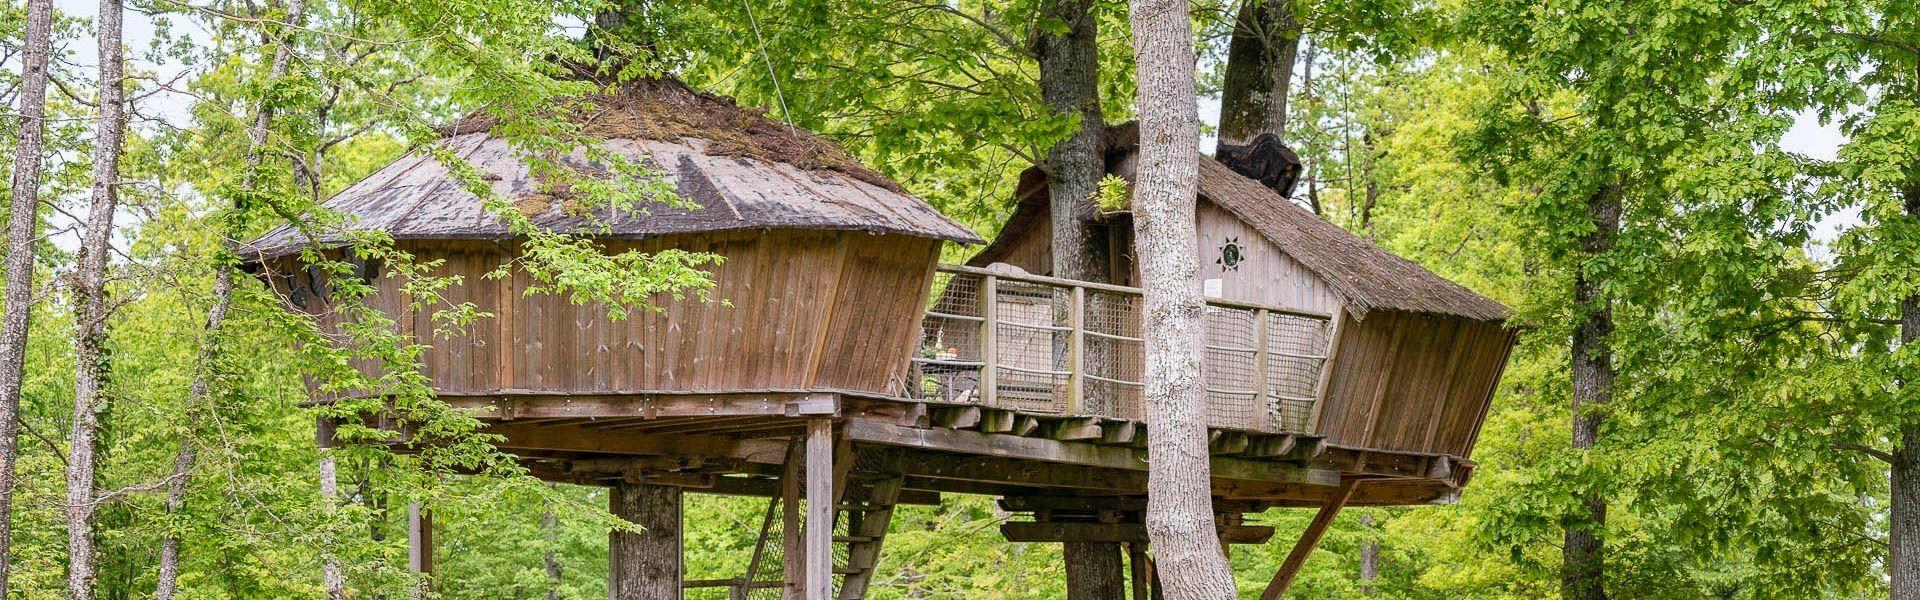 Camping Baumhäuser